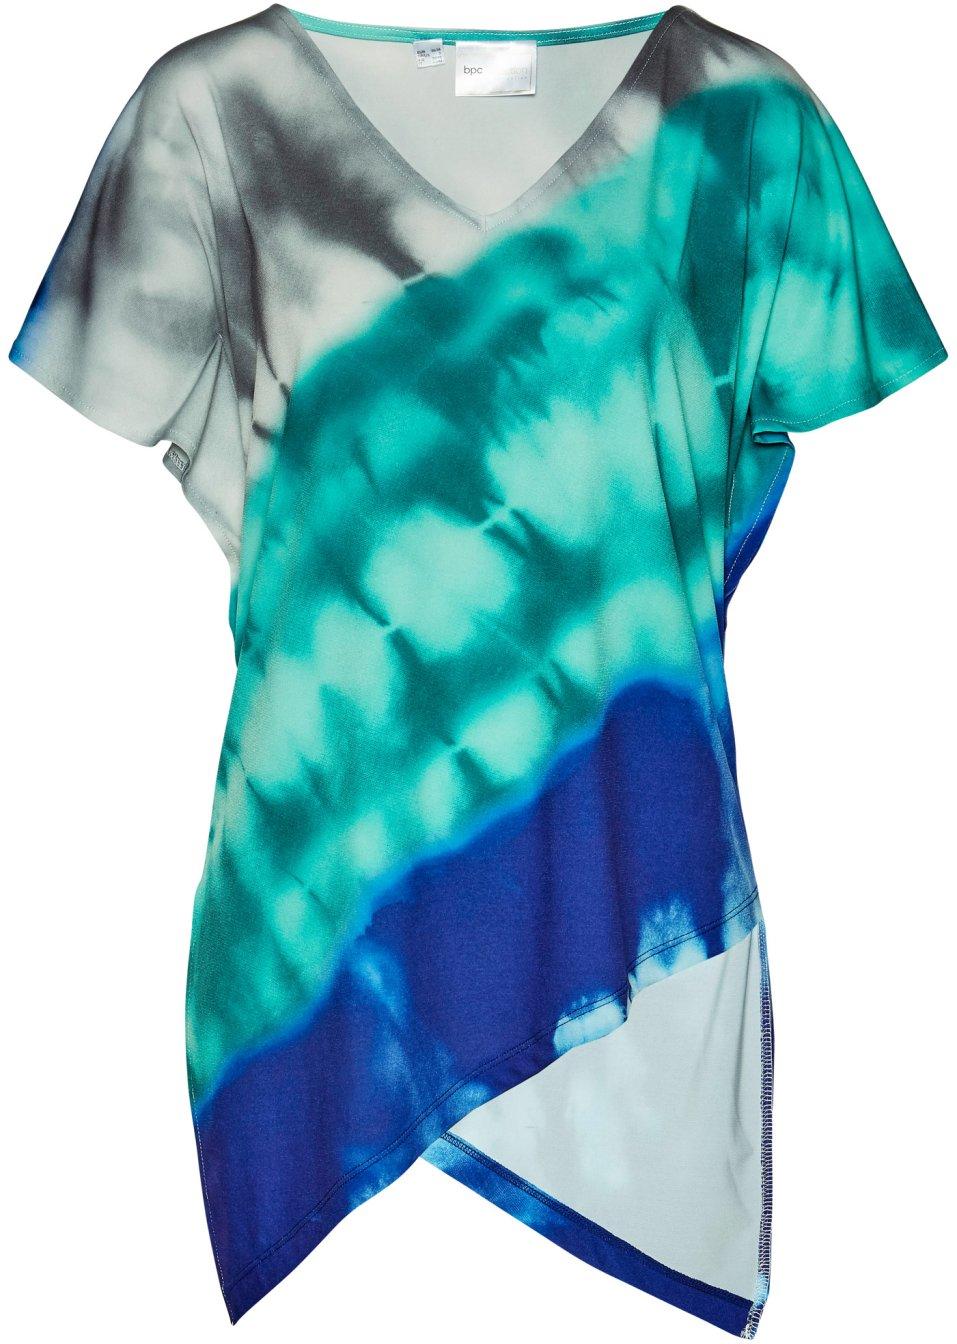 Jersey Tunika dunkelblau/mentholblau bedruckt - Damen - bpc selection - bonprix.de 0tctY Ef2iB